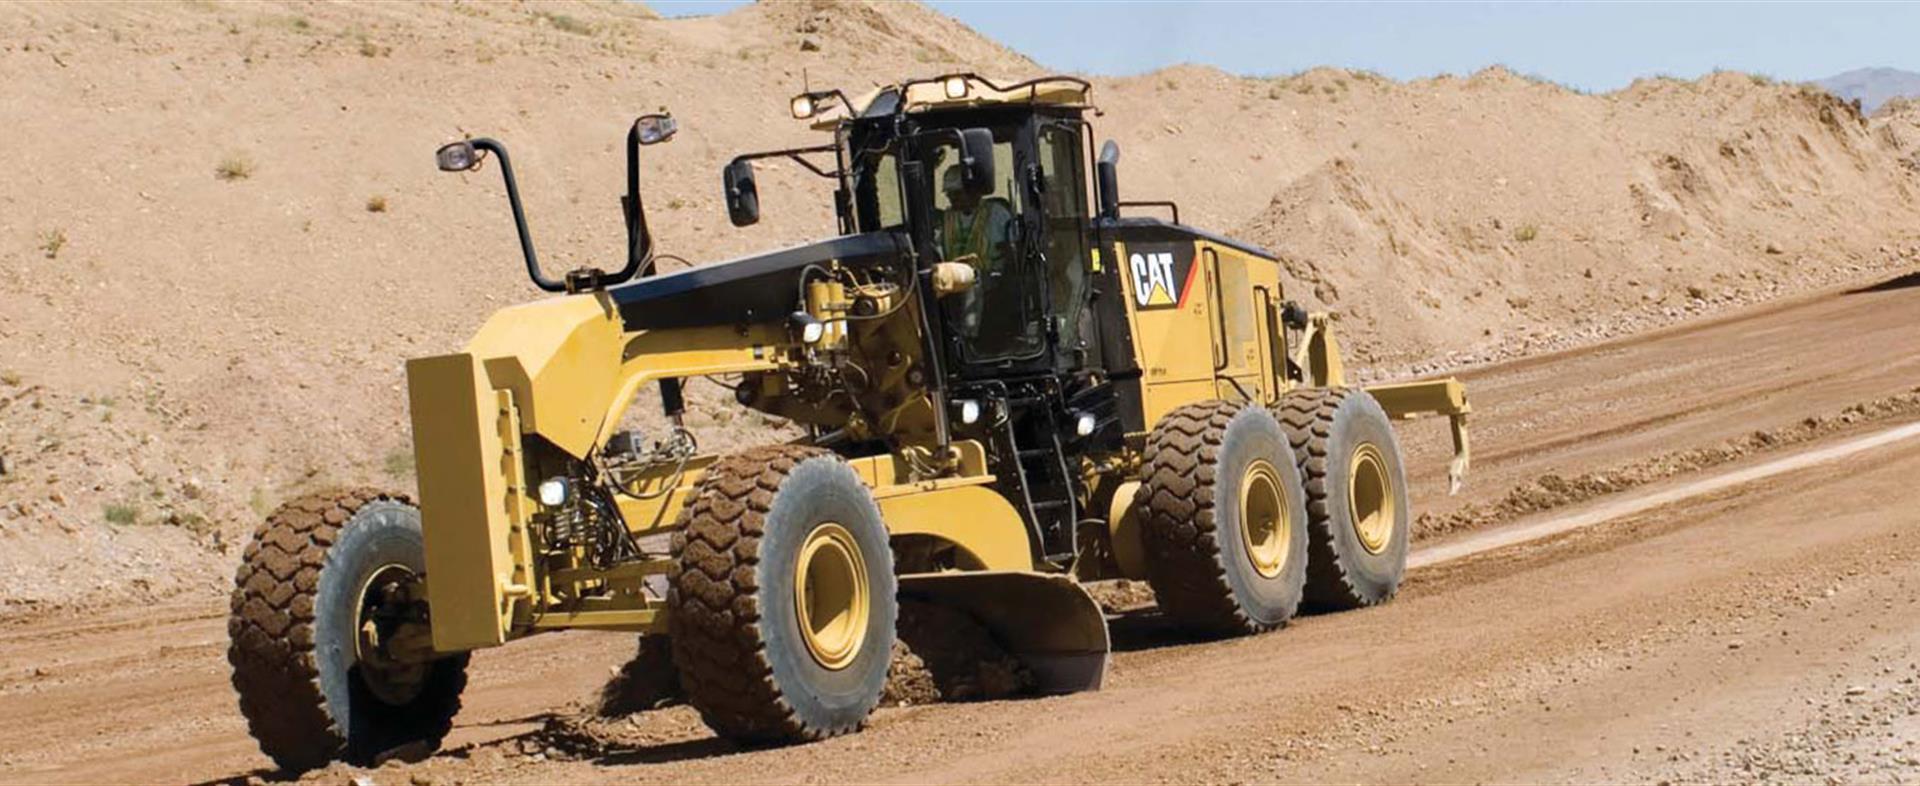 14M Motor Grader for Pipeline Construction